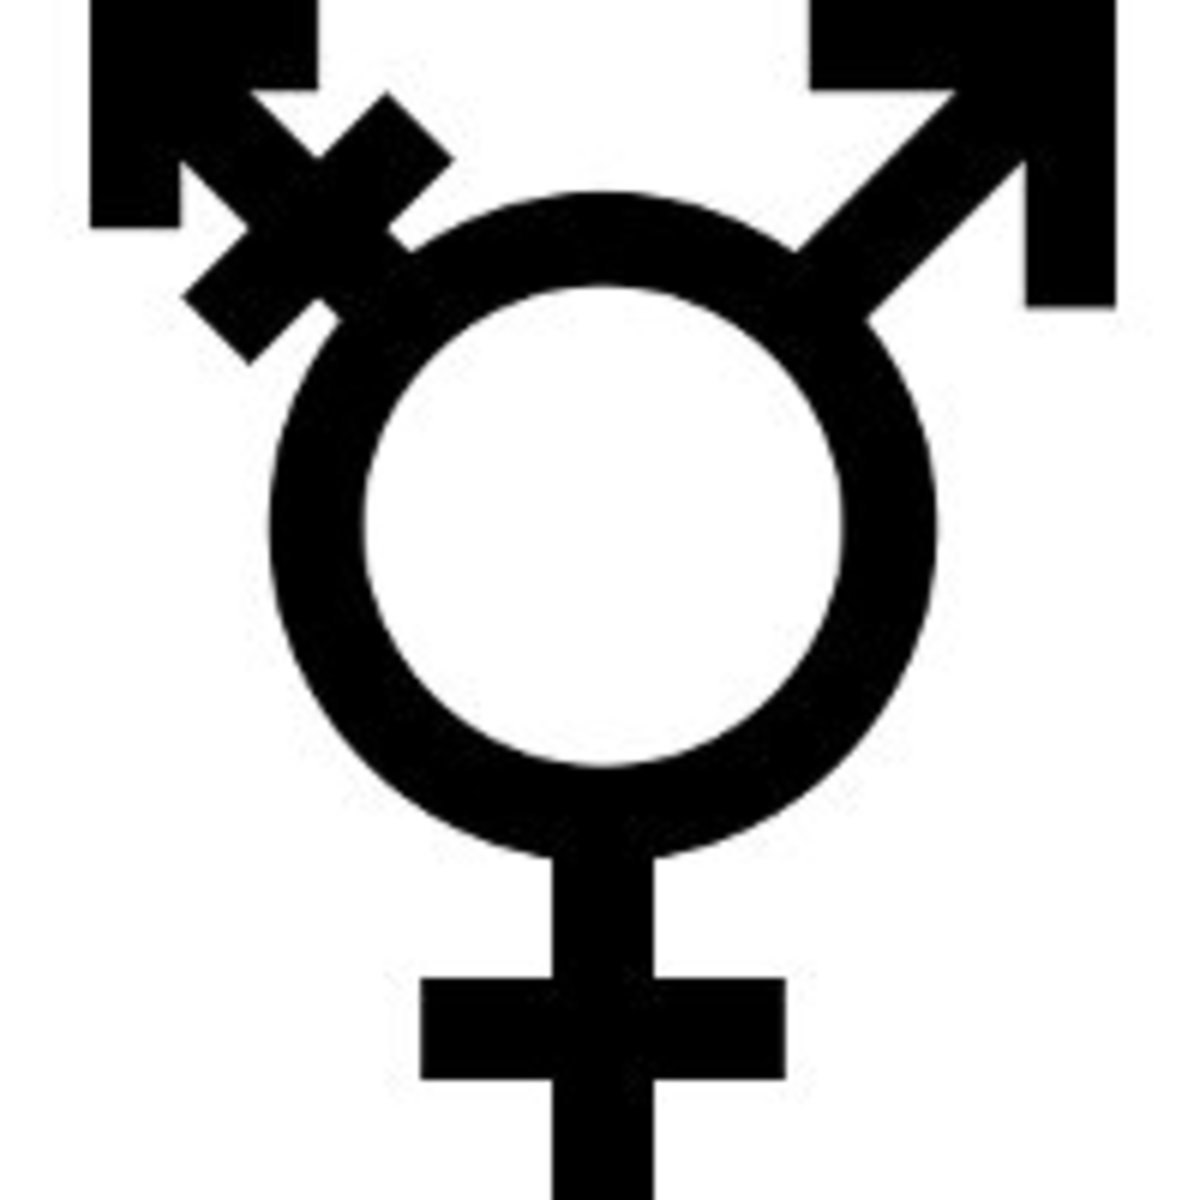 One variant of the transgender symbol